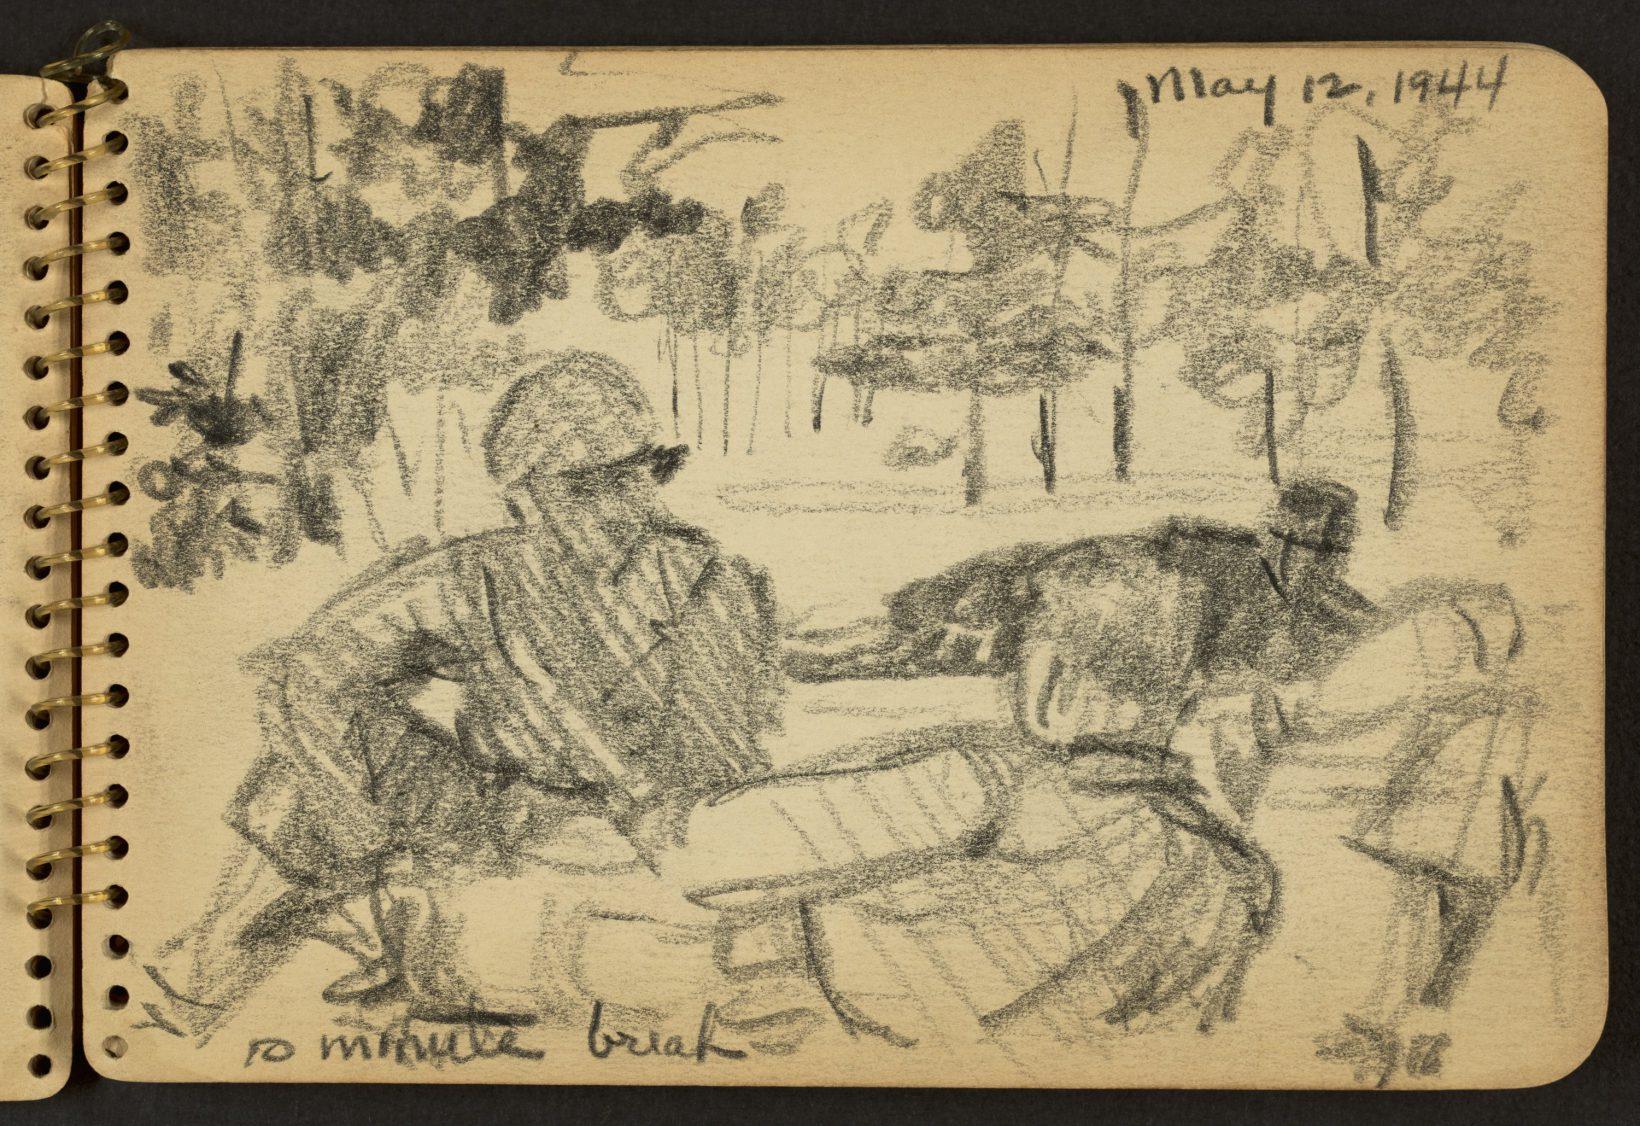 victor-lundy-carnet-croquis-seconde-guerre-mondiale-01